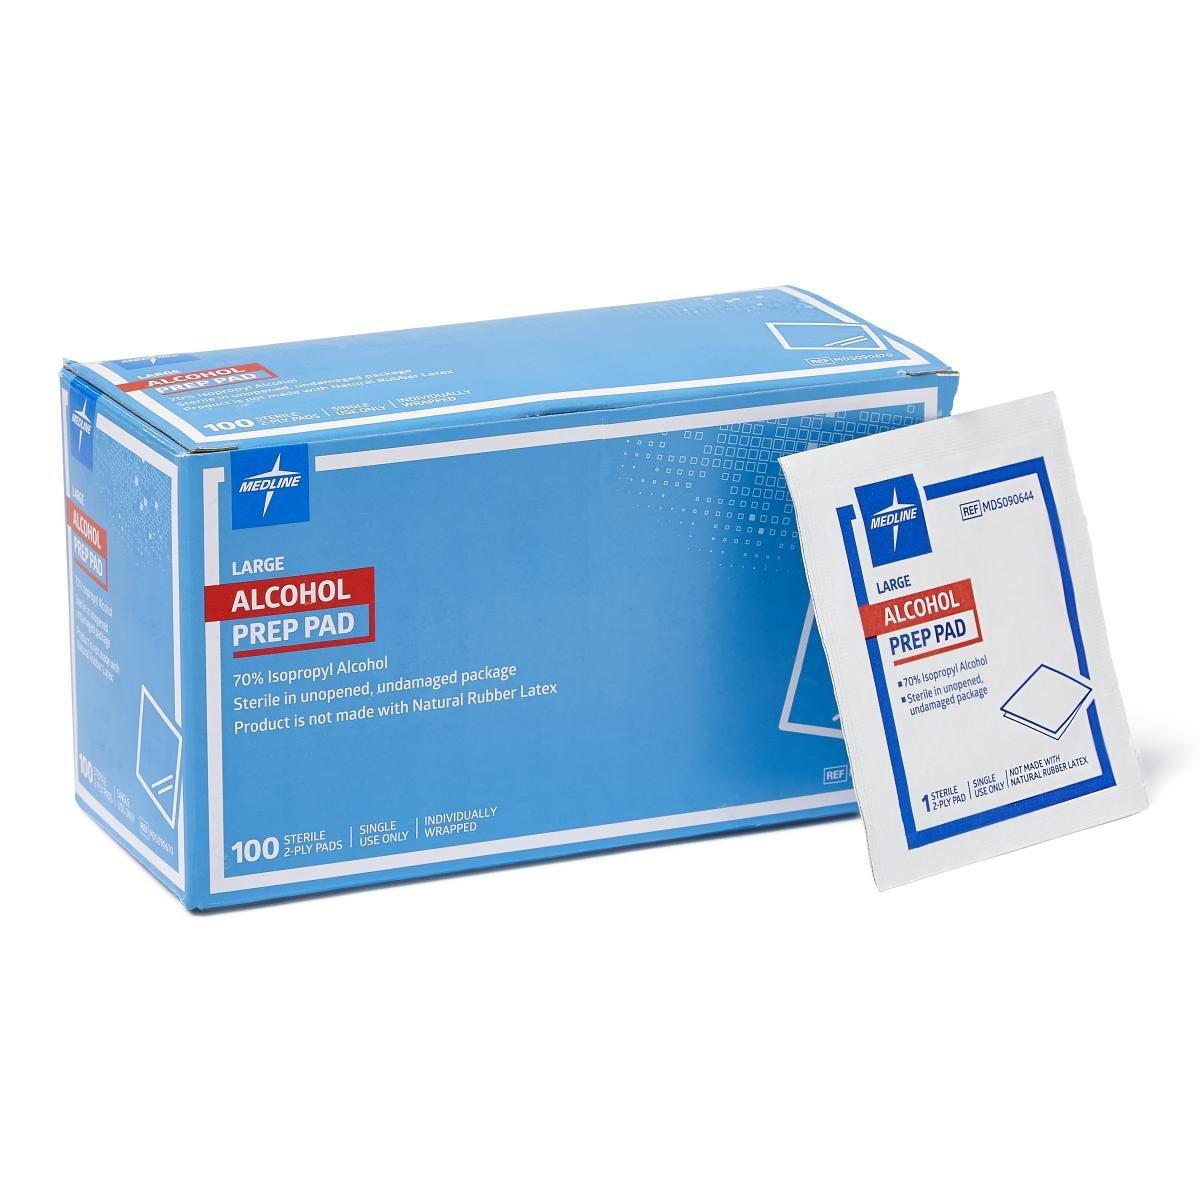 Medline MDS090670Z Pad, Prep, Alcohol, Large, 2-Ply, Sterile (Pack of 100)